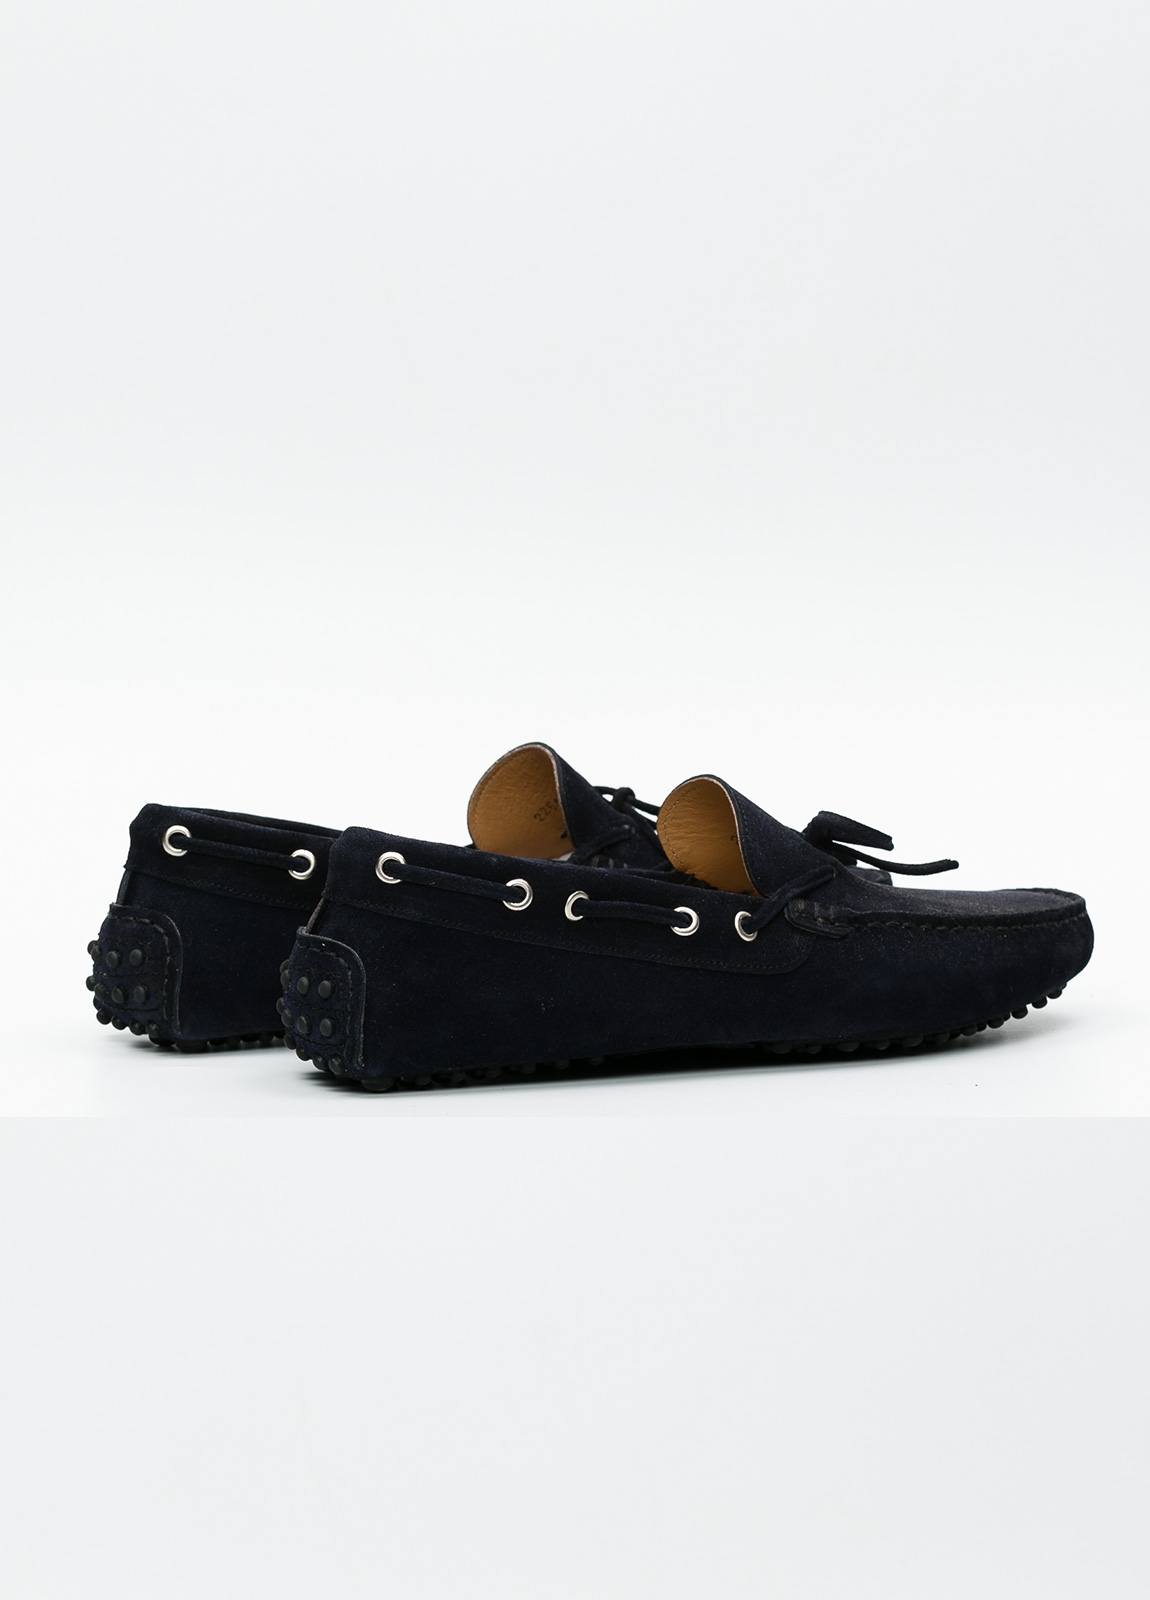 Zapato mocasín Sport color azul marino, 100% Piel. - Ítem1